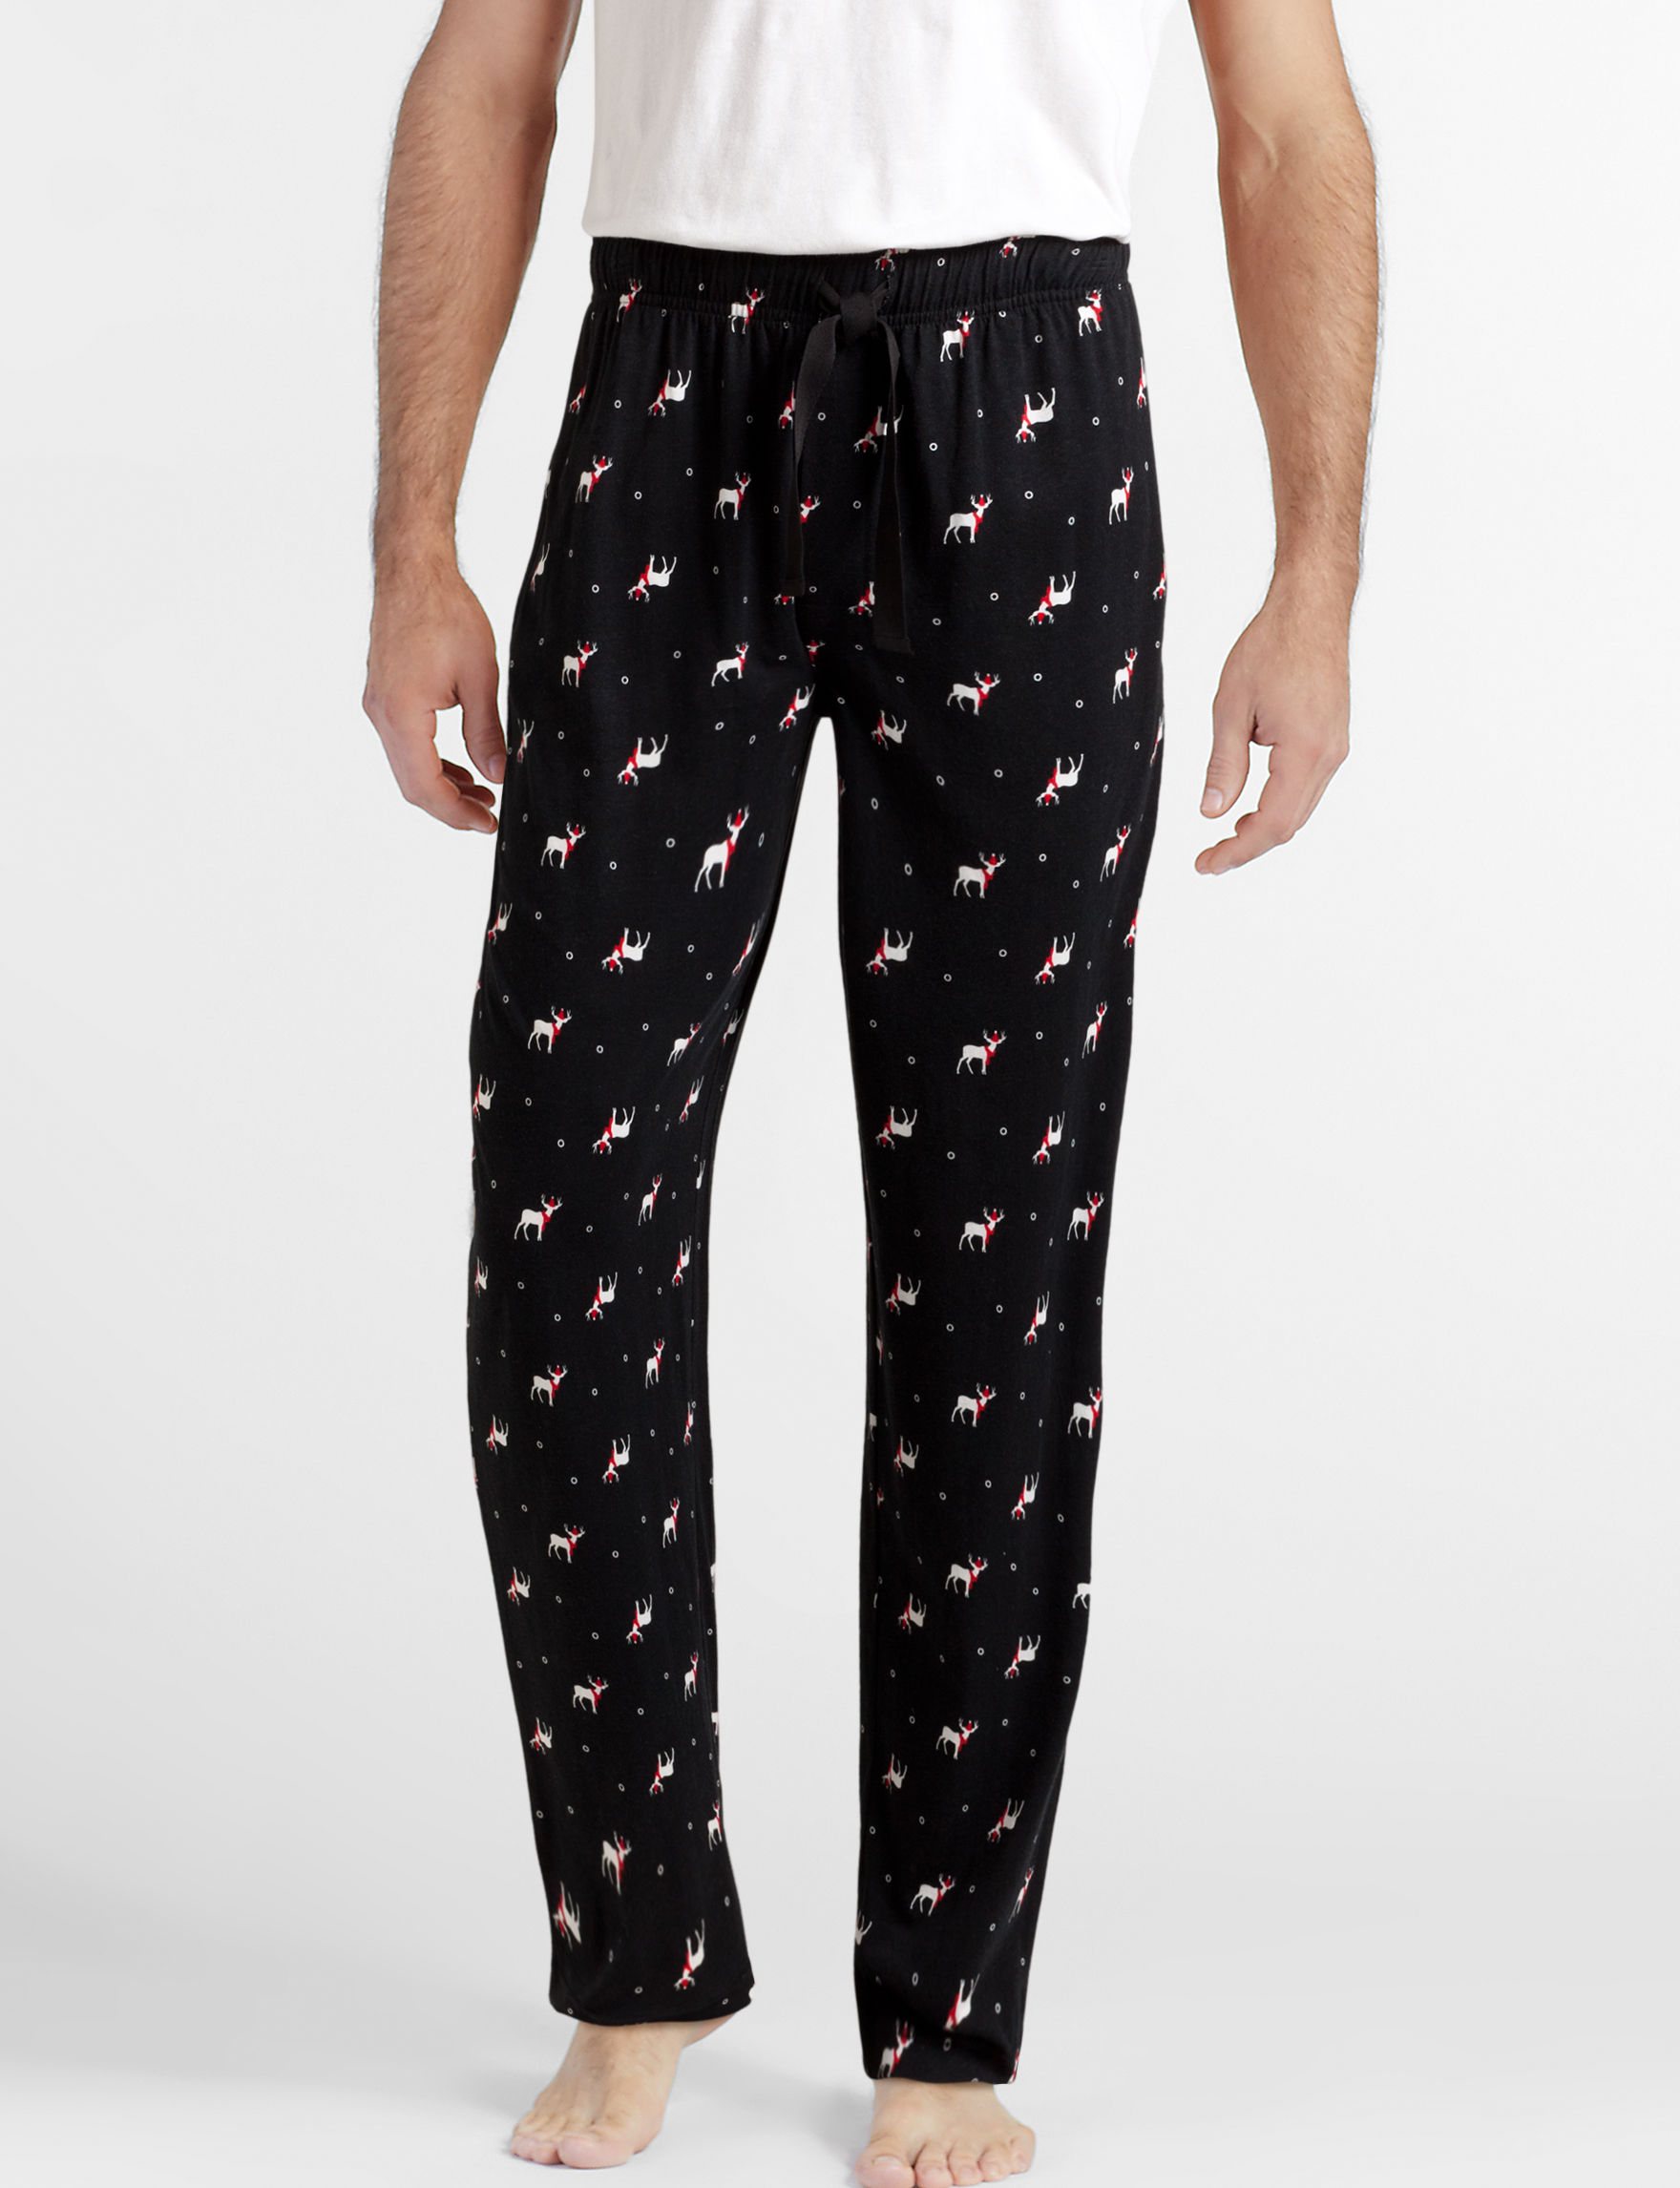 Ivy Crew Black / White Pajama Bottoms